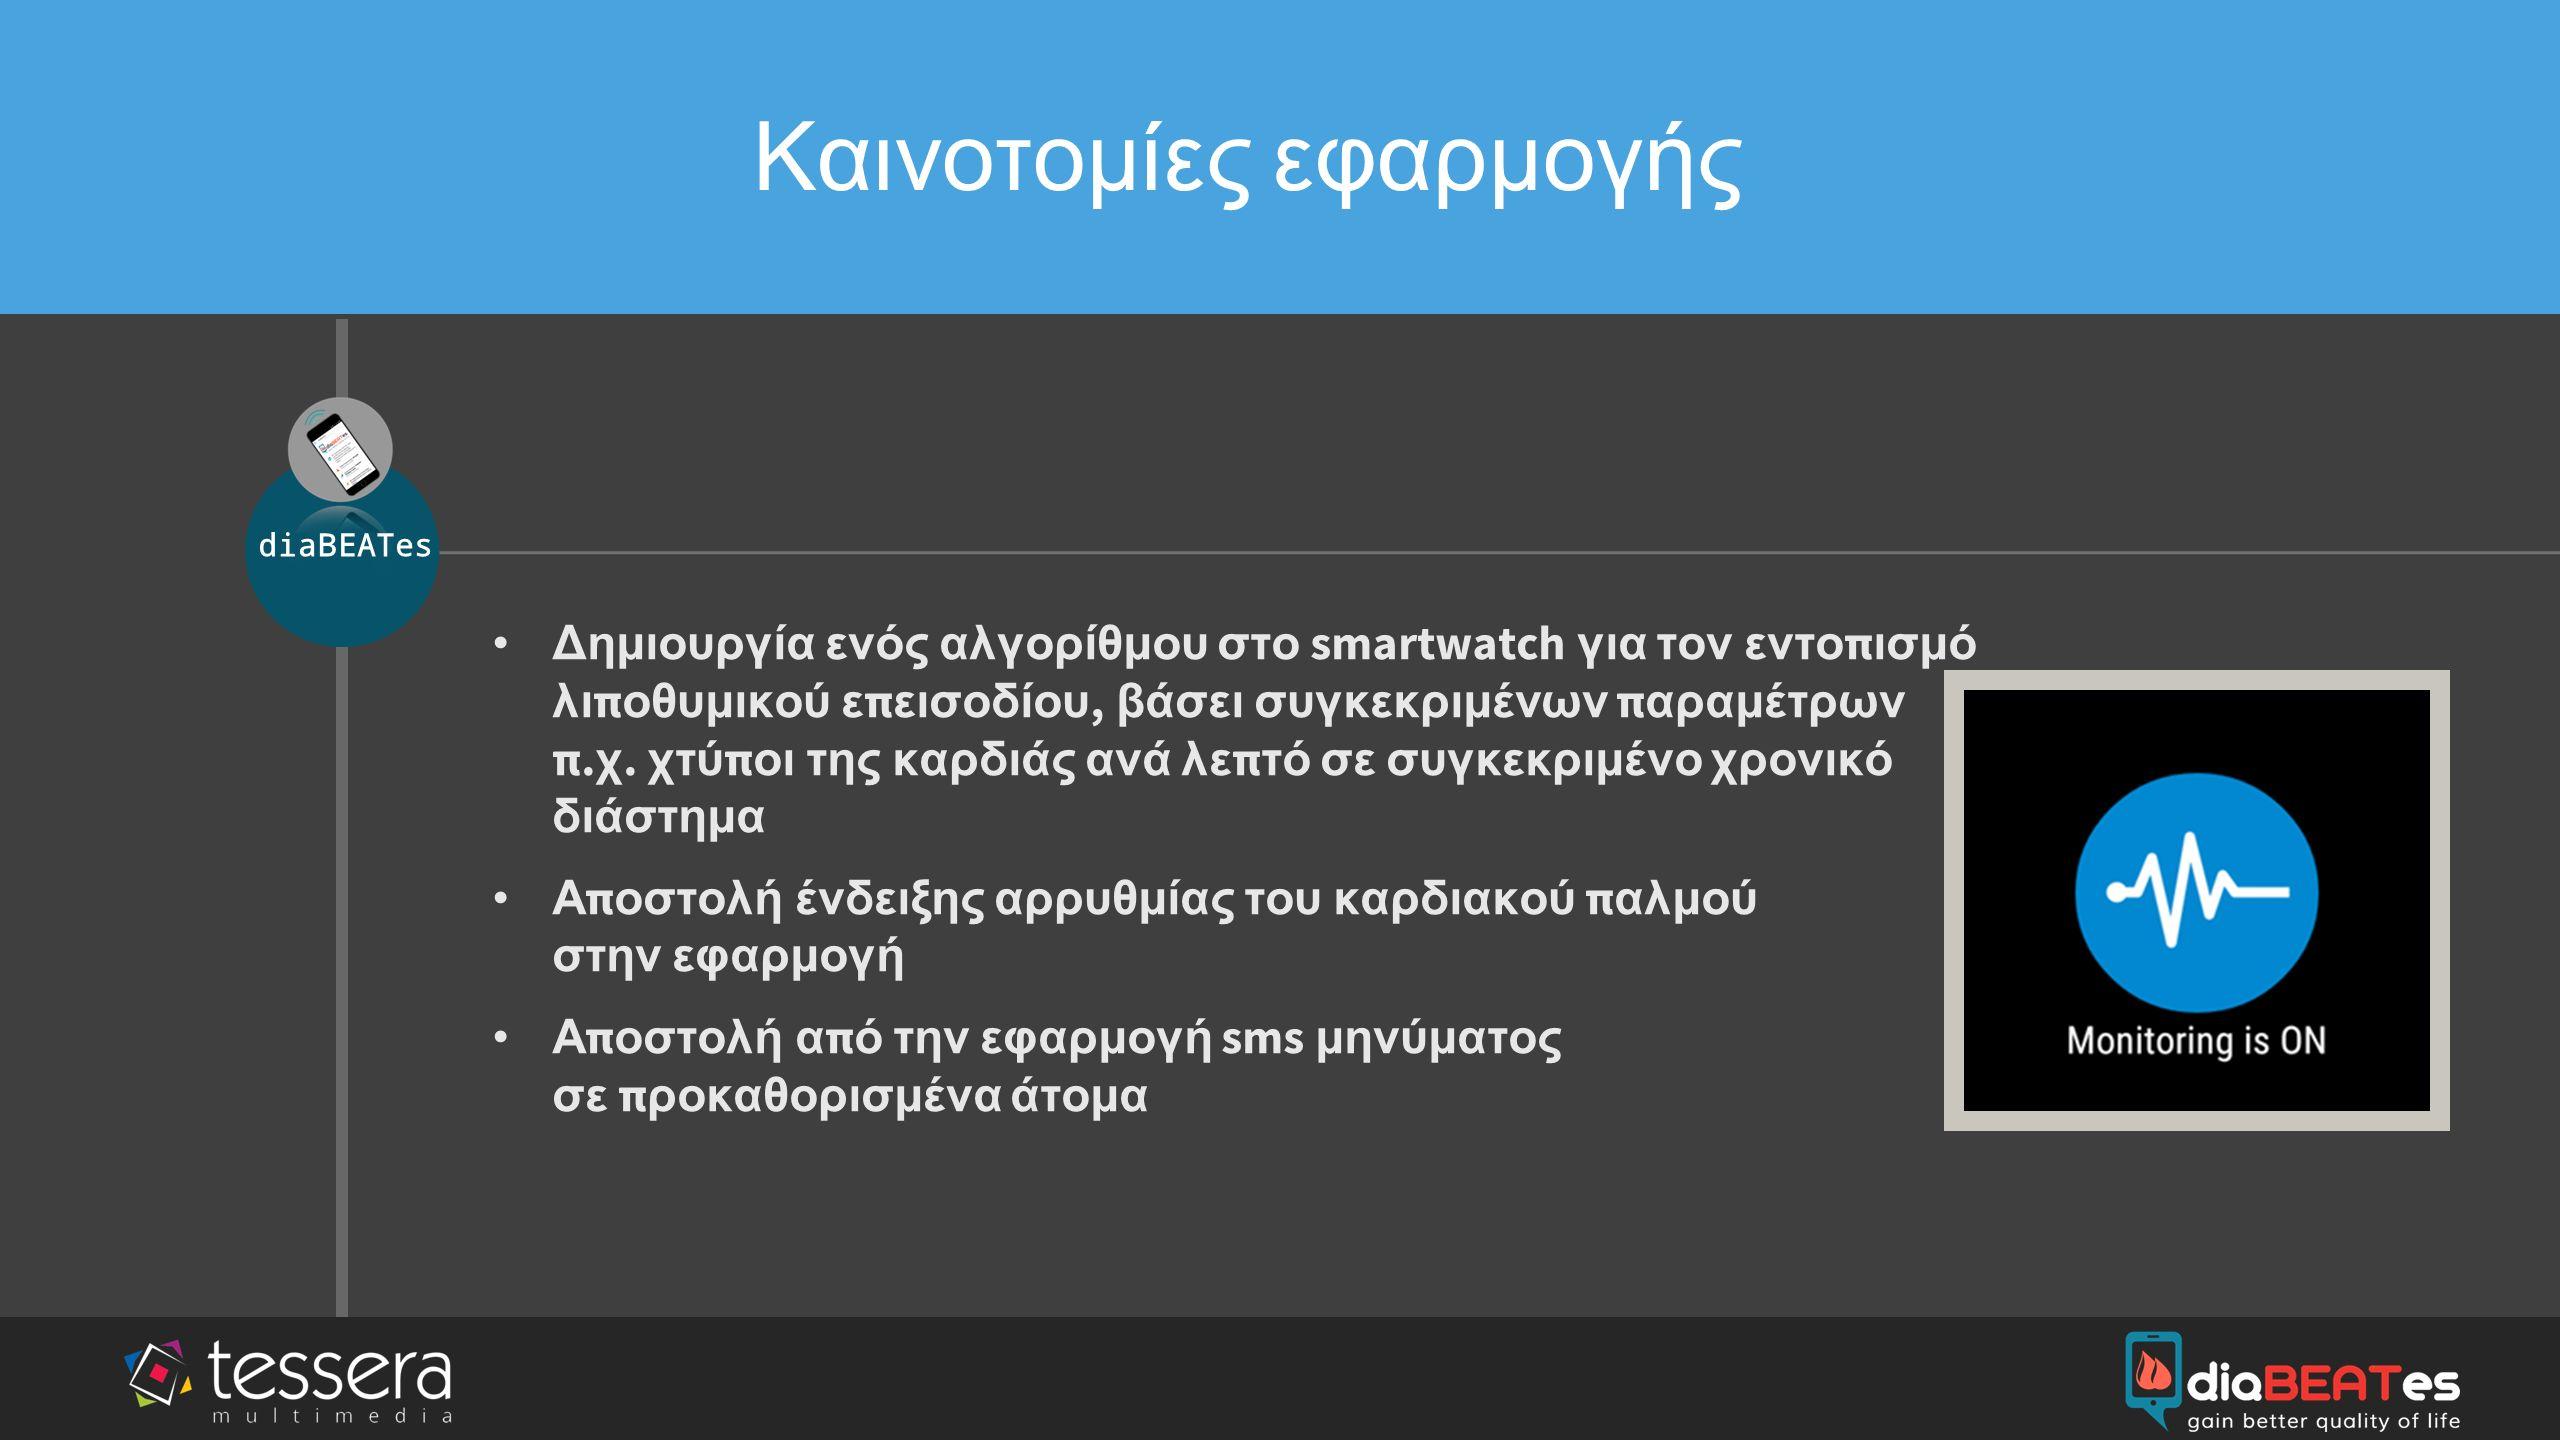 company logo & name Καινοτομίες εφαρμογής diaBEATes Δημιουργία ενός αλγορίθμου στο smartwatch για τον εντο π ισμό λι π οθυμικού ε π εισοδίου, βάσει συγκεκριμένων π αραμέτρων π.